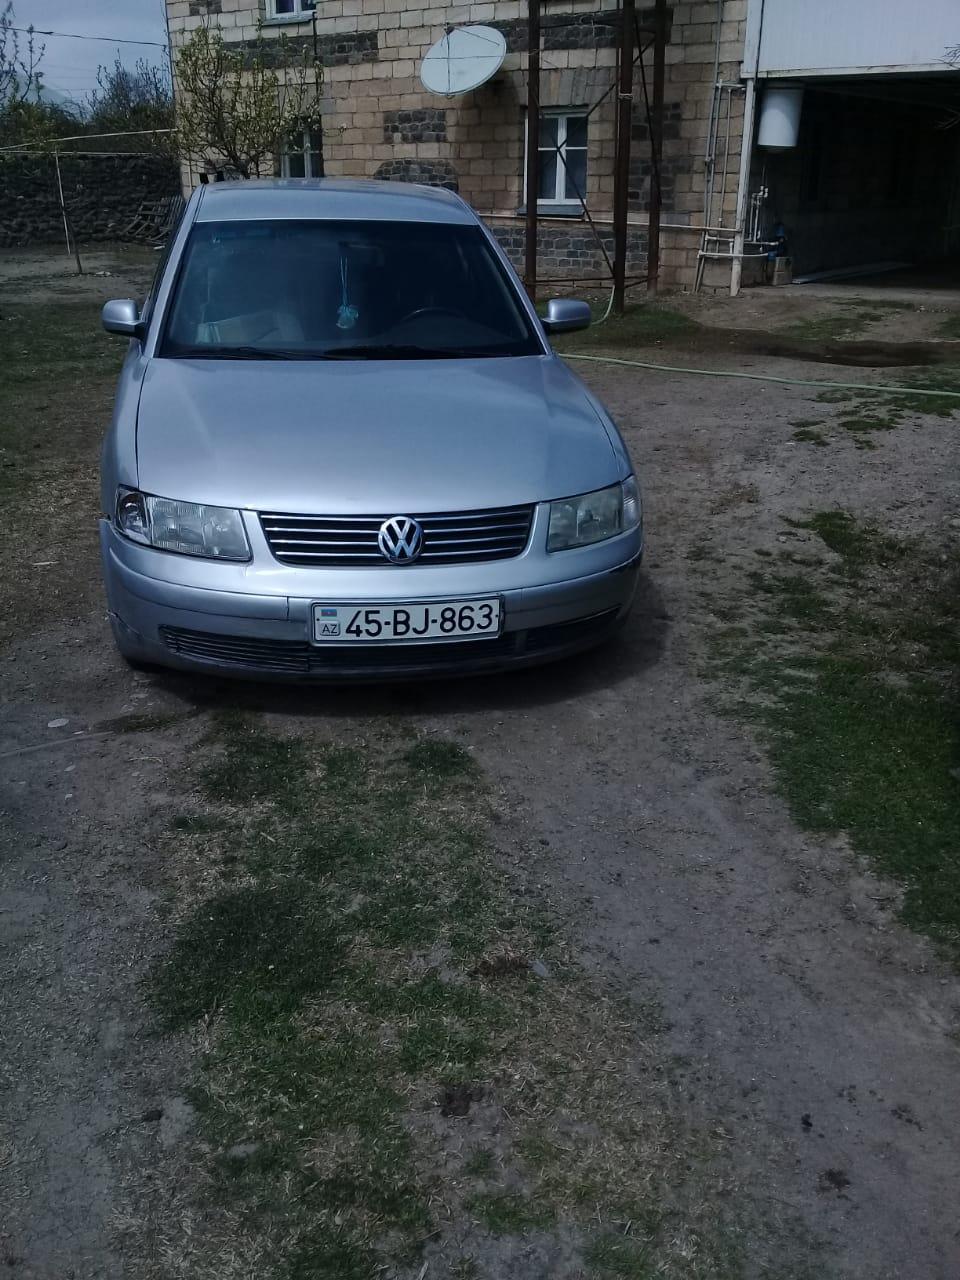 Volkswagen Passat 2.0(lt) 1998 İkinci əl  $2400